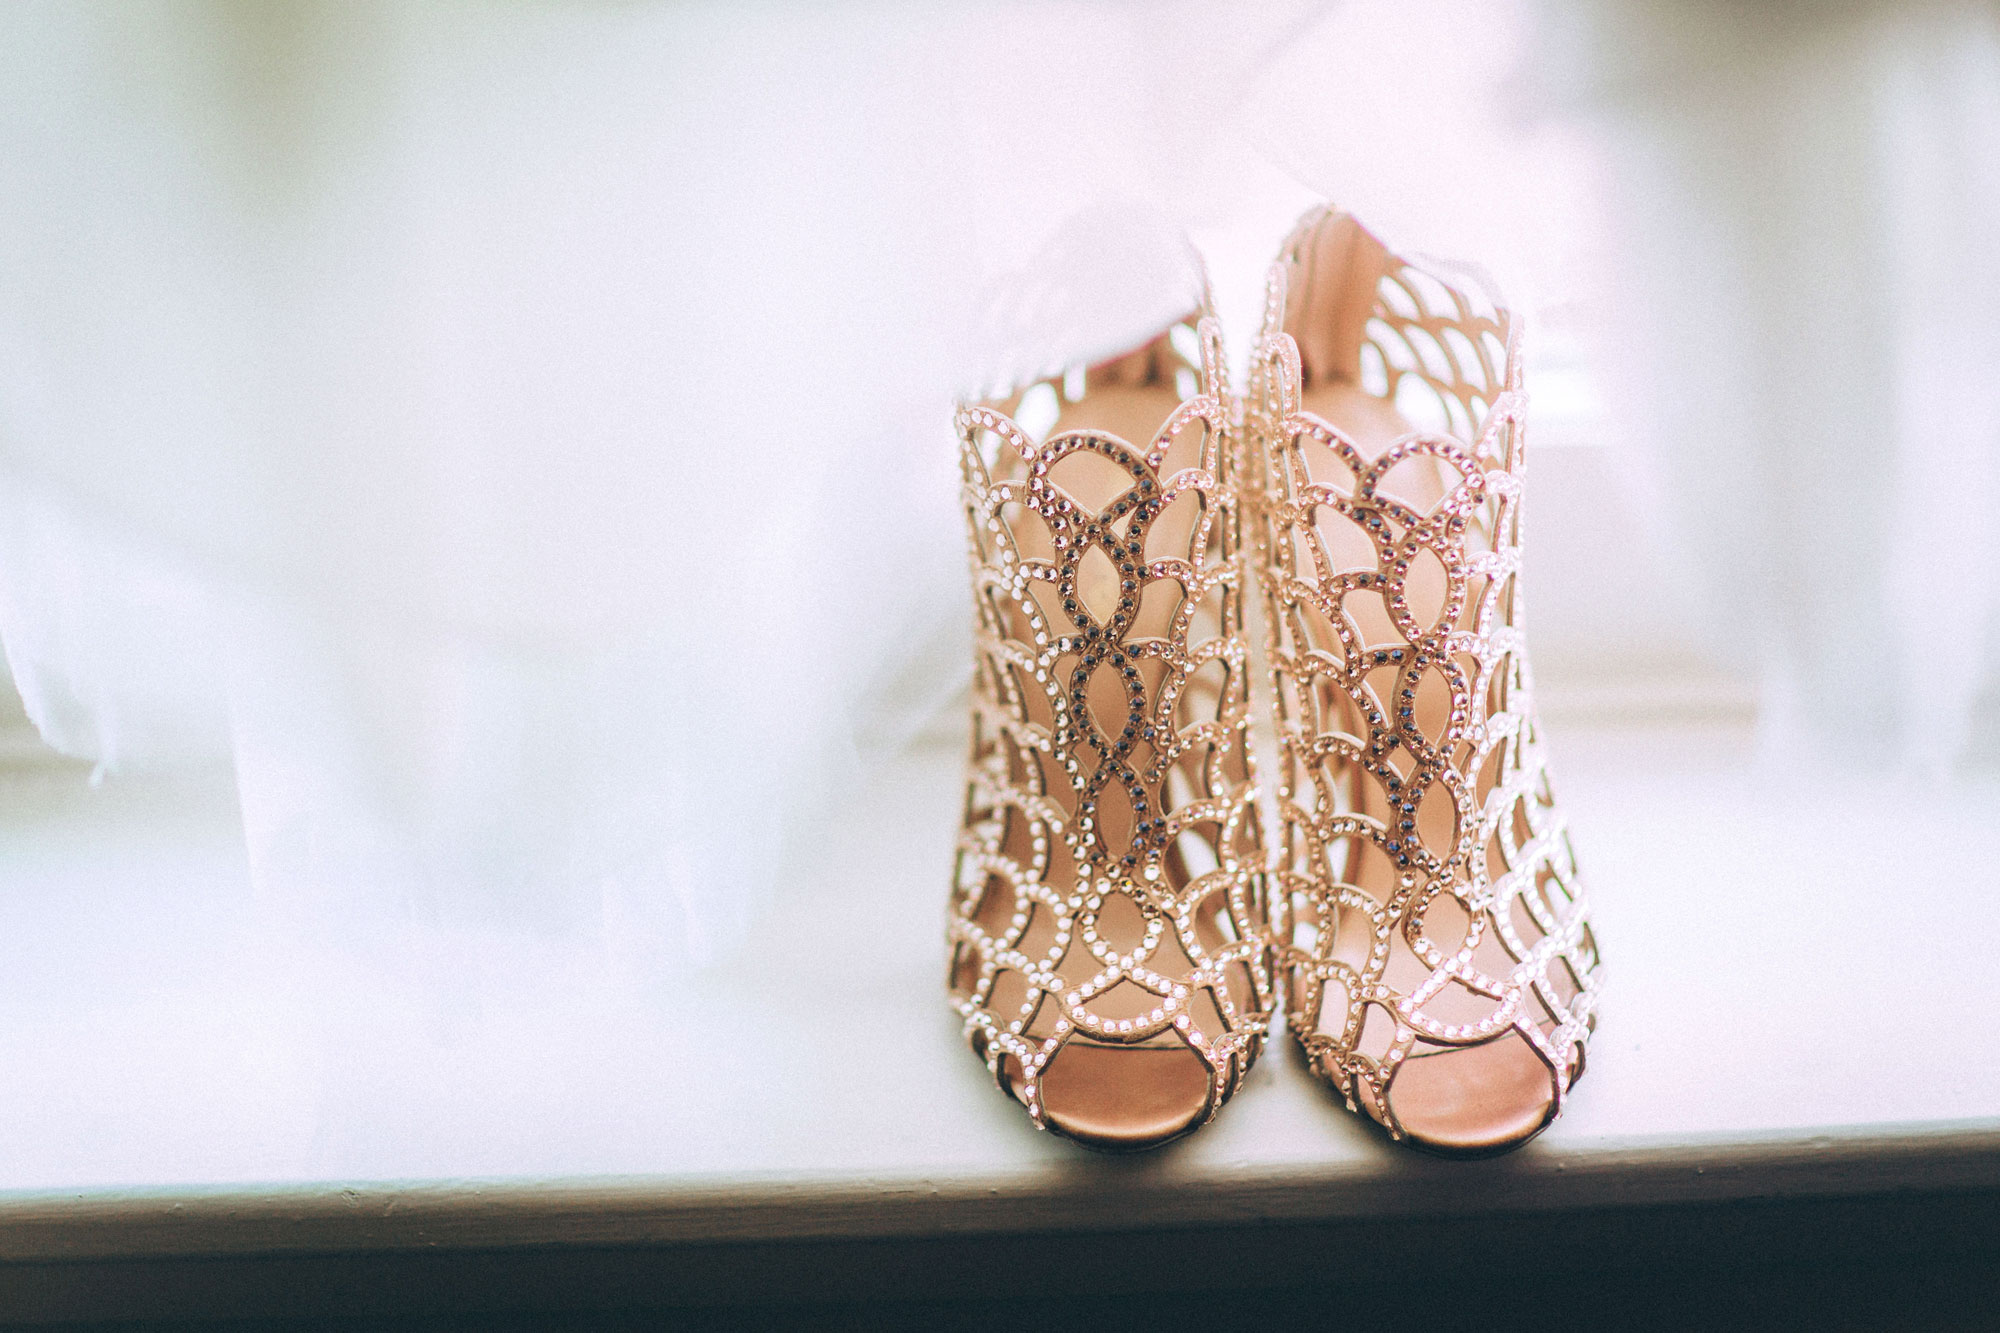 Sergio Rossi Mermaid Swarovski Crystal Booties, Black Tie Wedding, Nashville Wedding, Southern Wedding, Glam Wedding